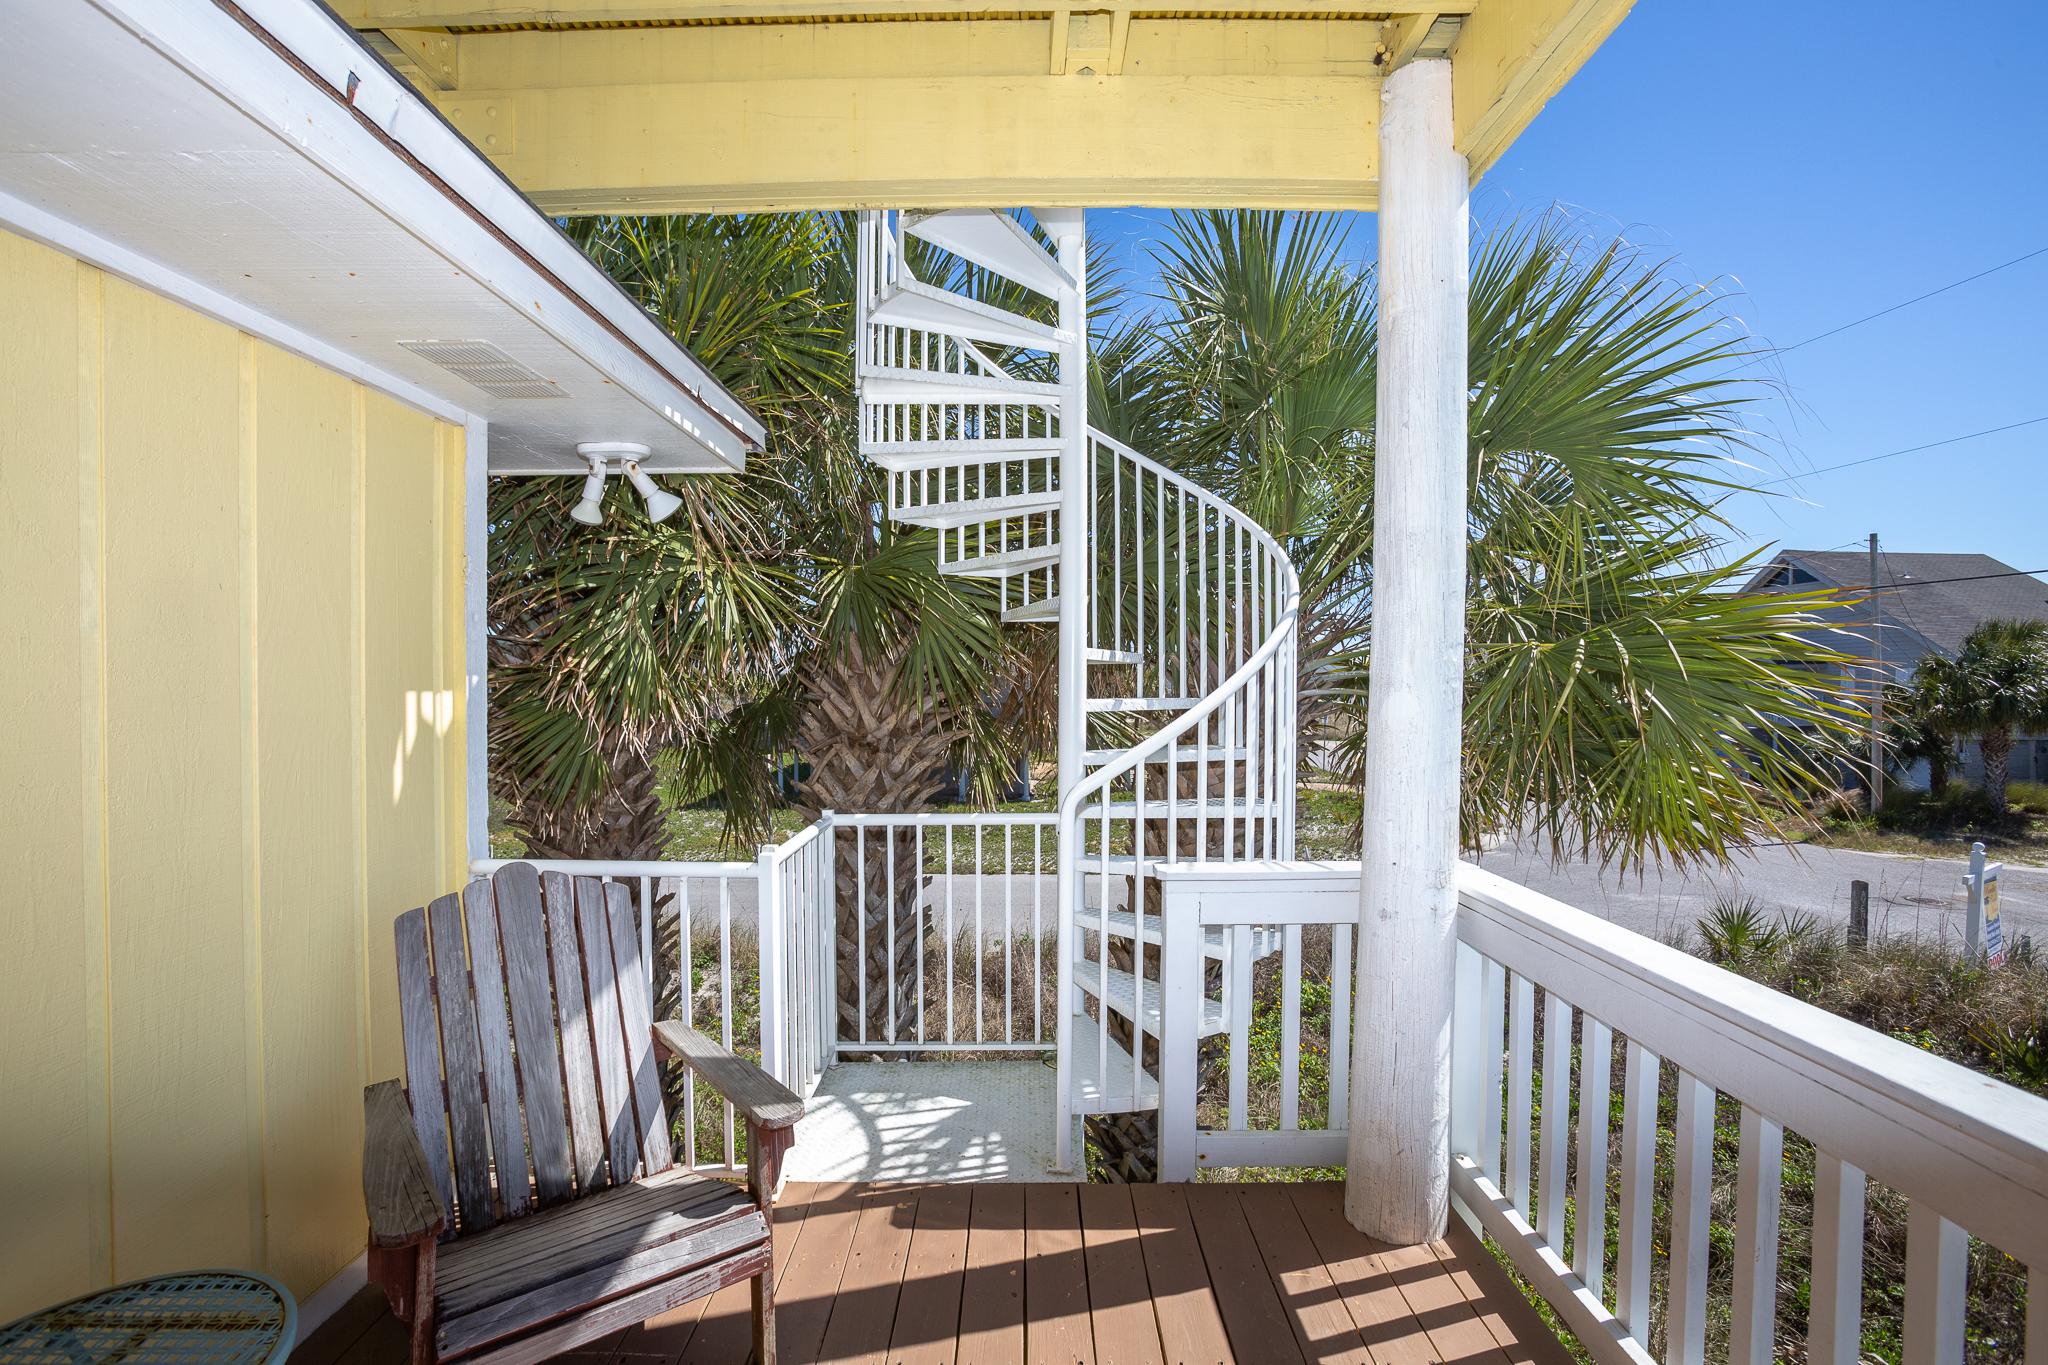 Maldonado 1015 - Sea the Big Picture House/Cottage rental in Pensacola Beach House Rentals in Pensacola Beach Florida - #35